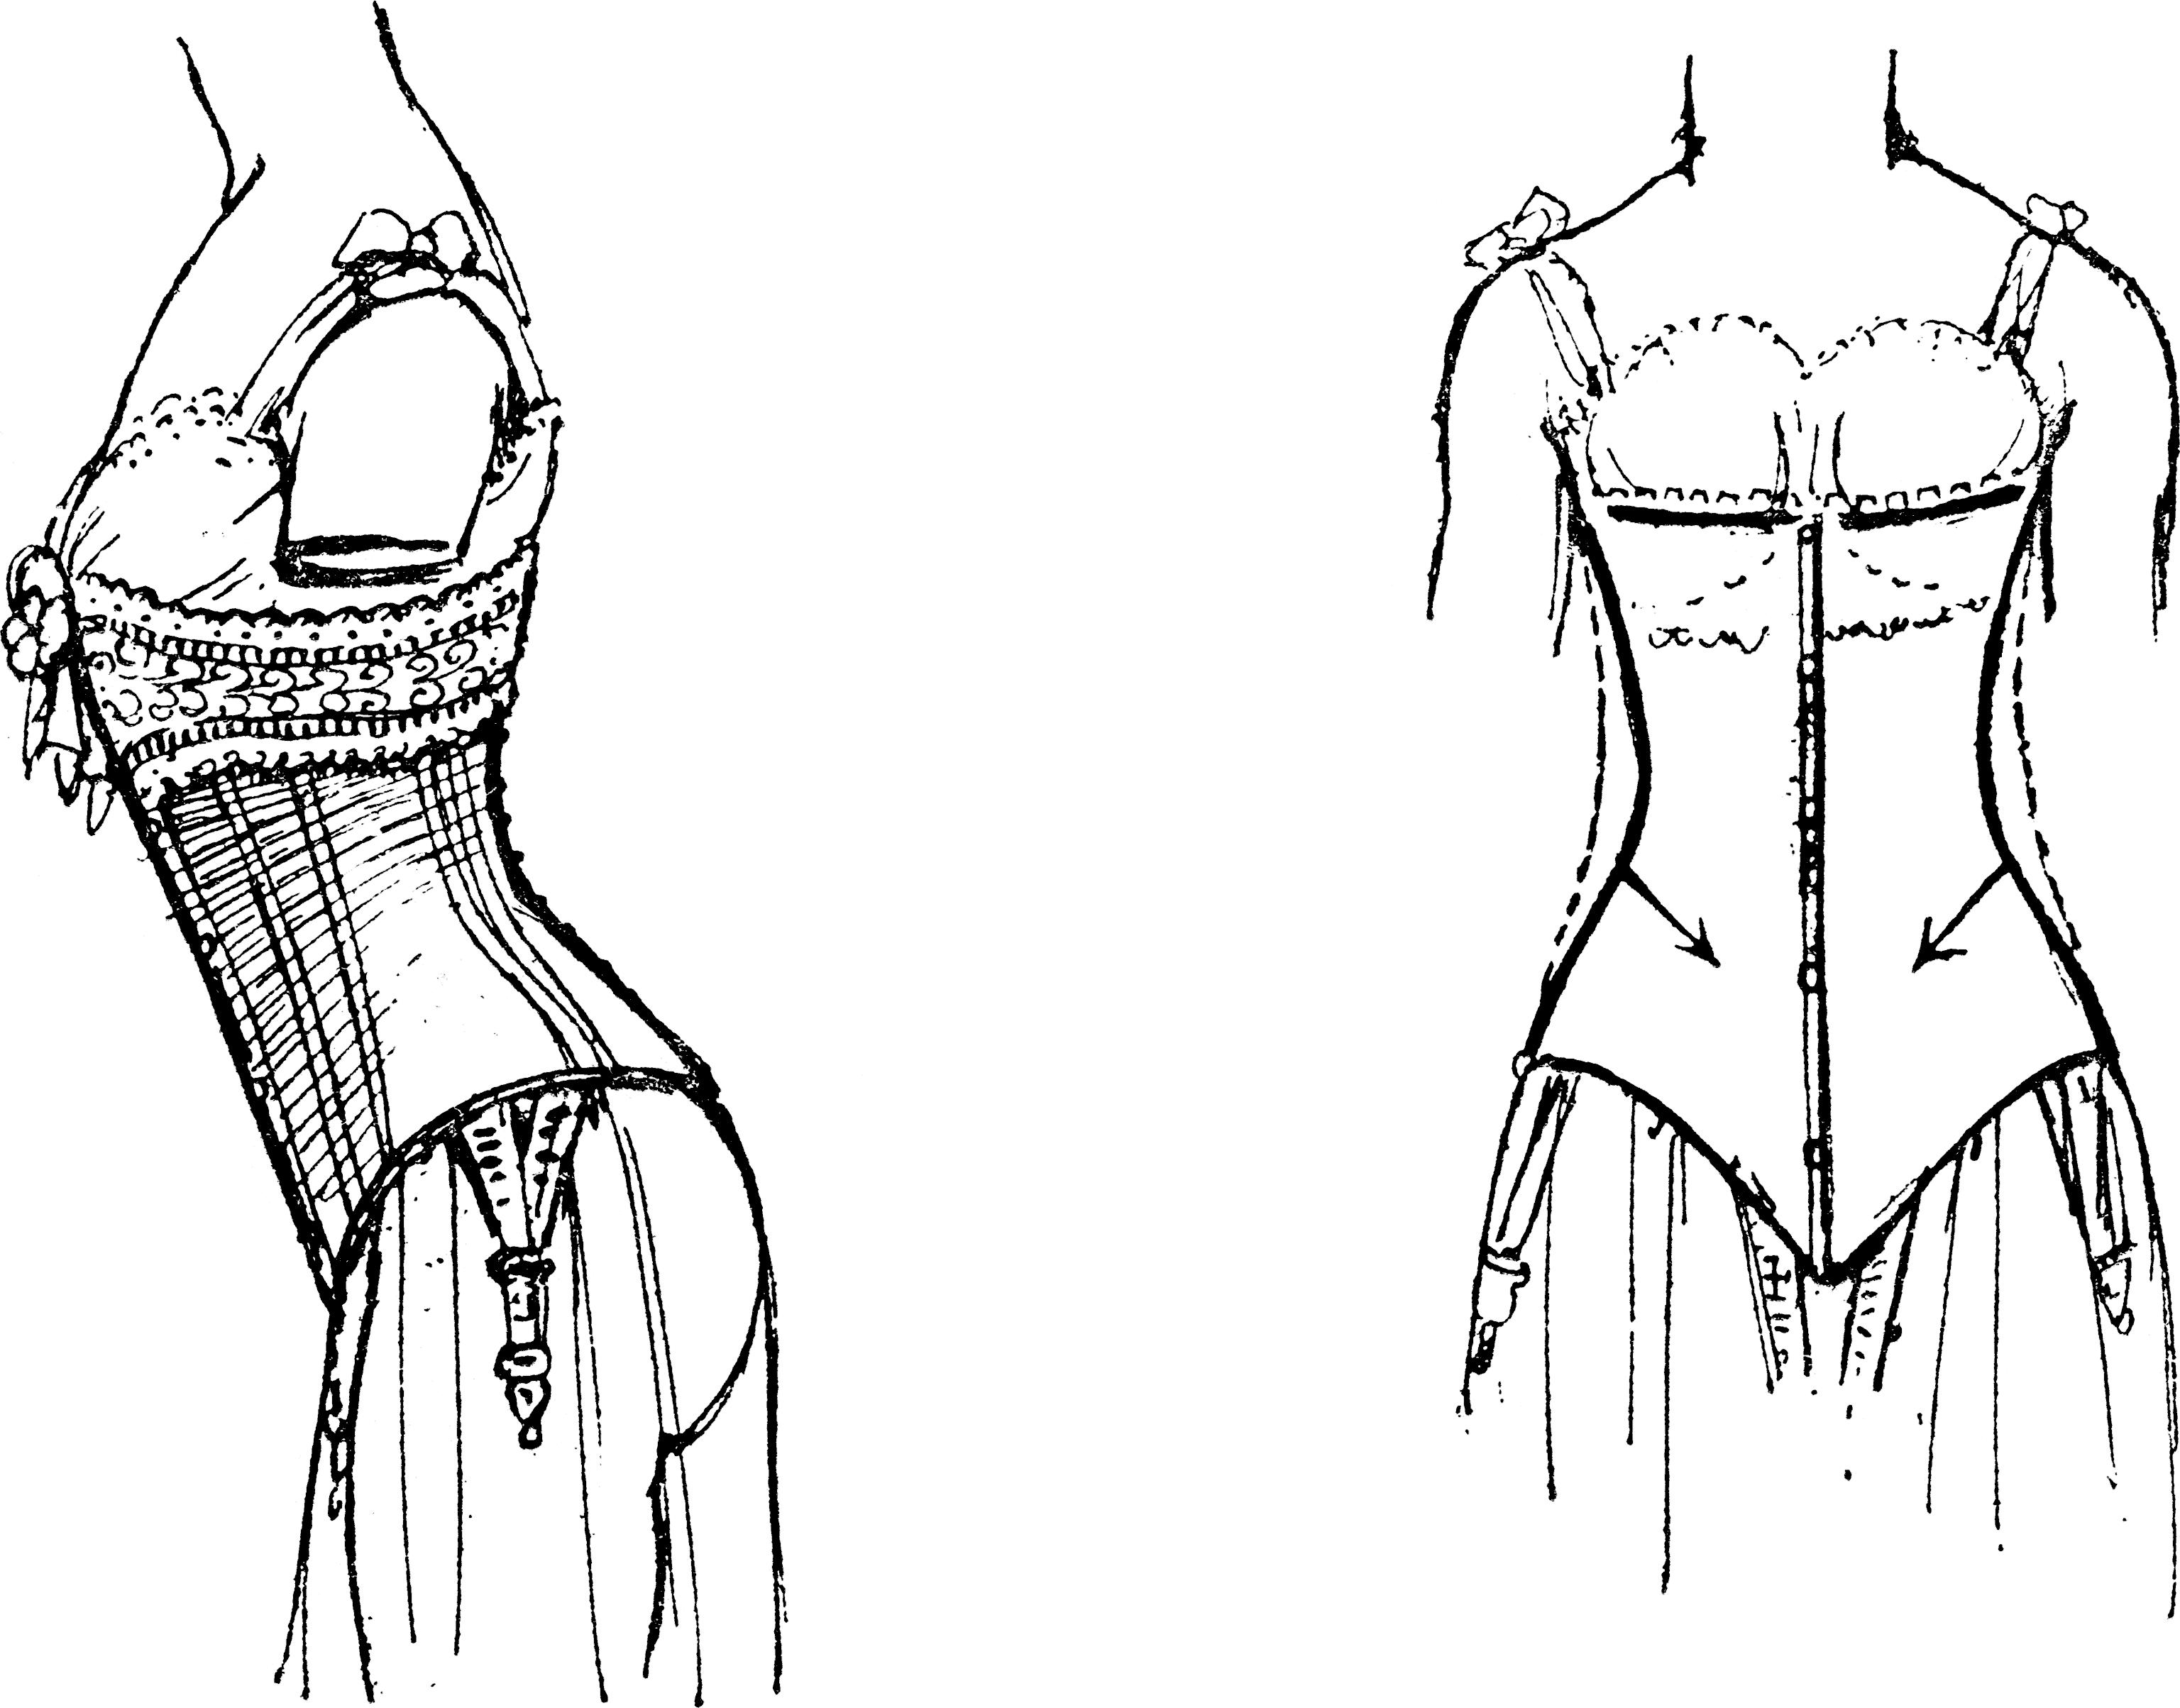 File:Le corset a la derniere mode.png - Wikimedia Commons